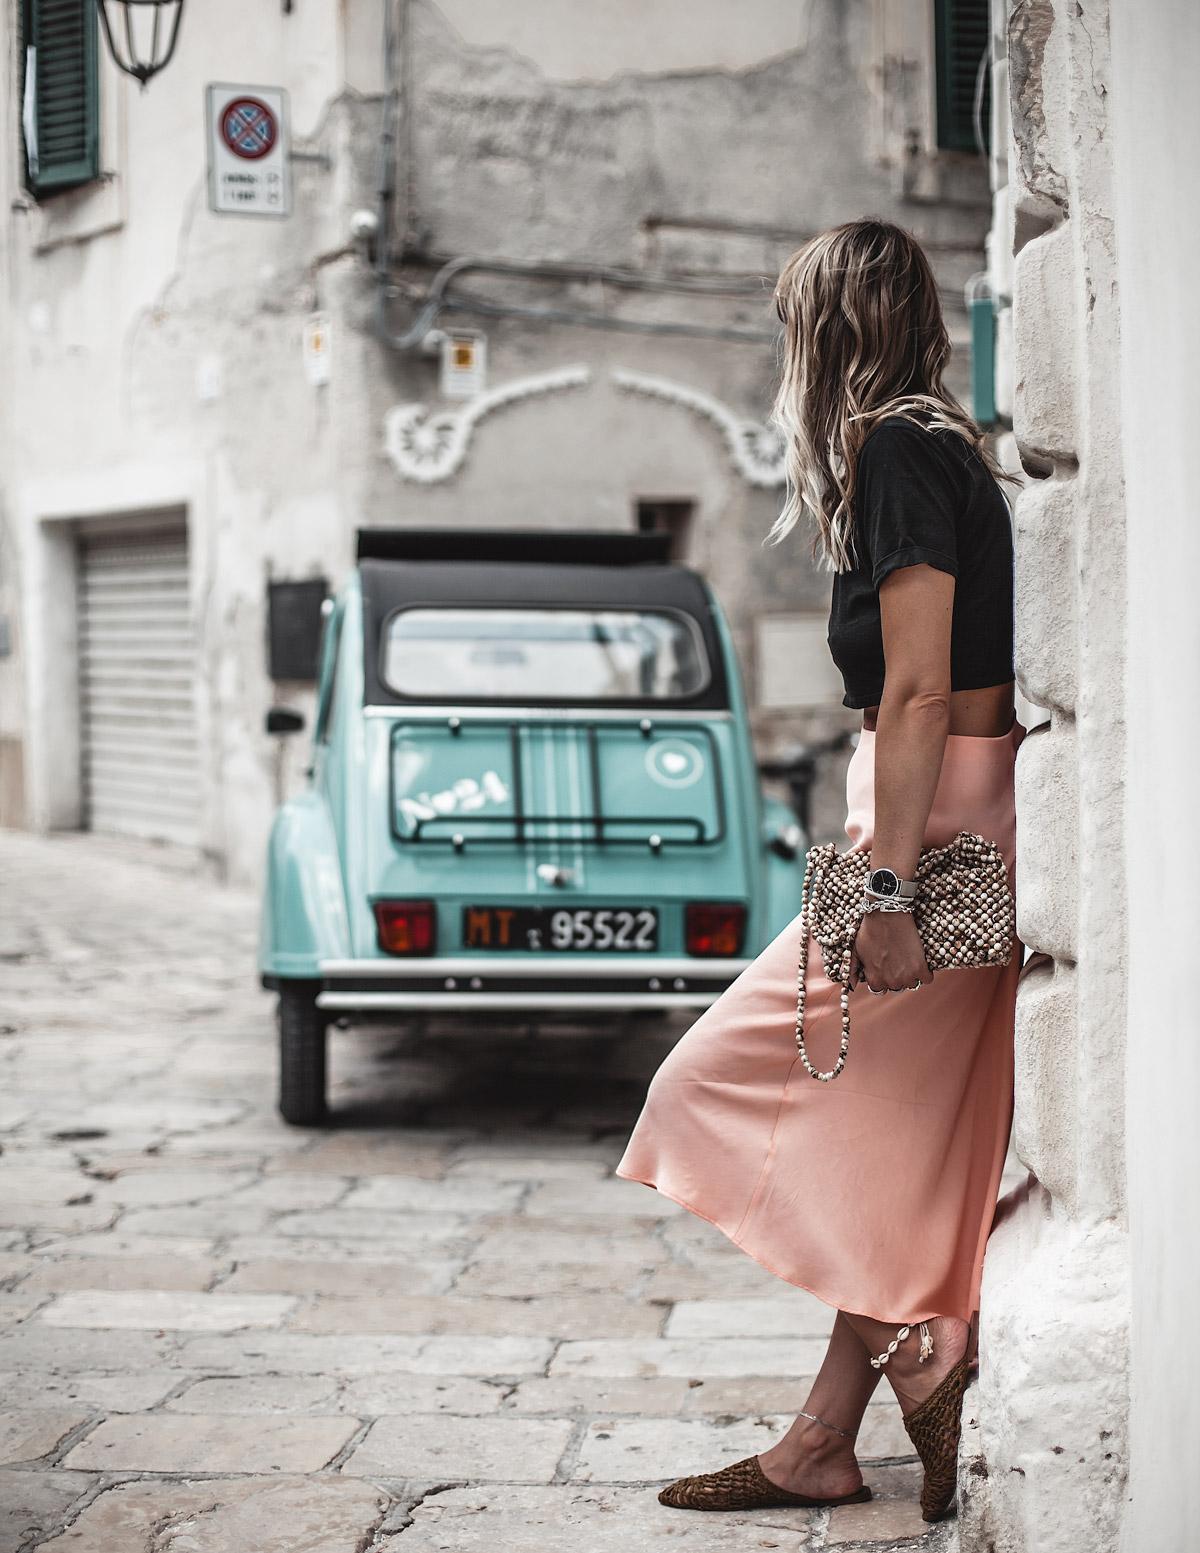 car, 2VC, Monopoli, Puglia, Italy, white houses